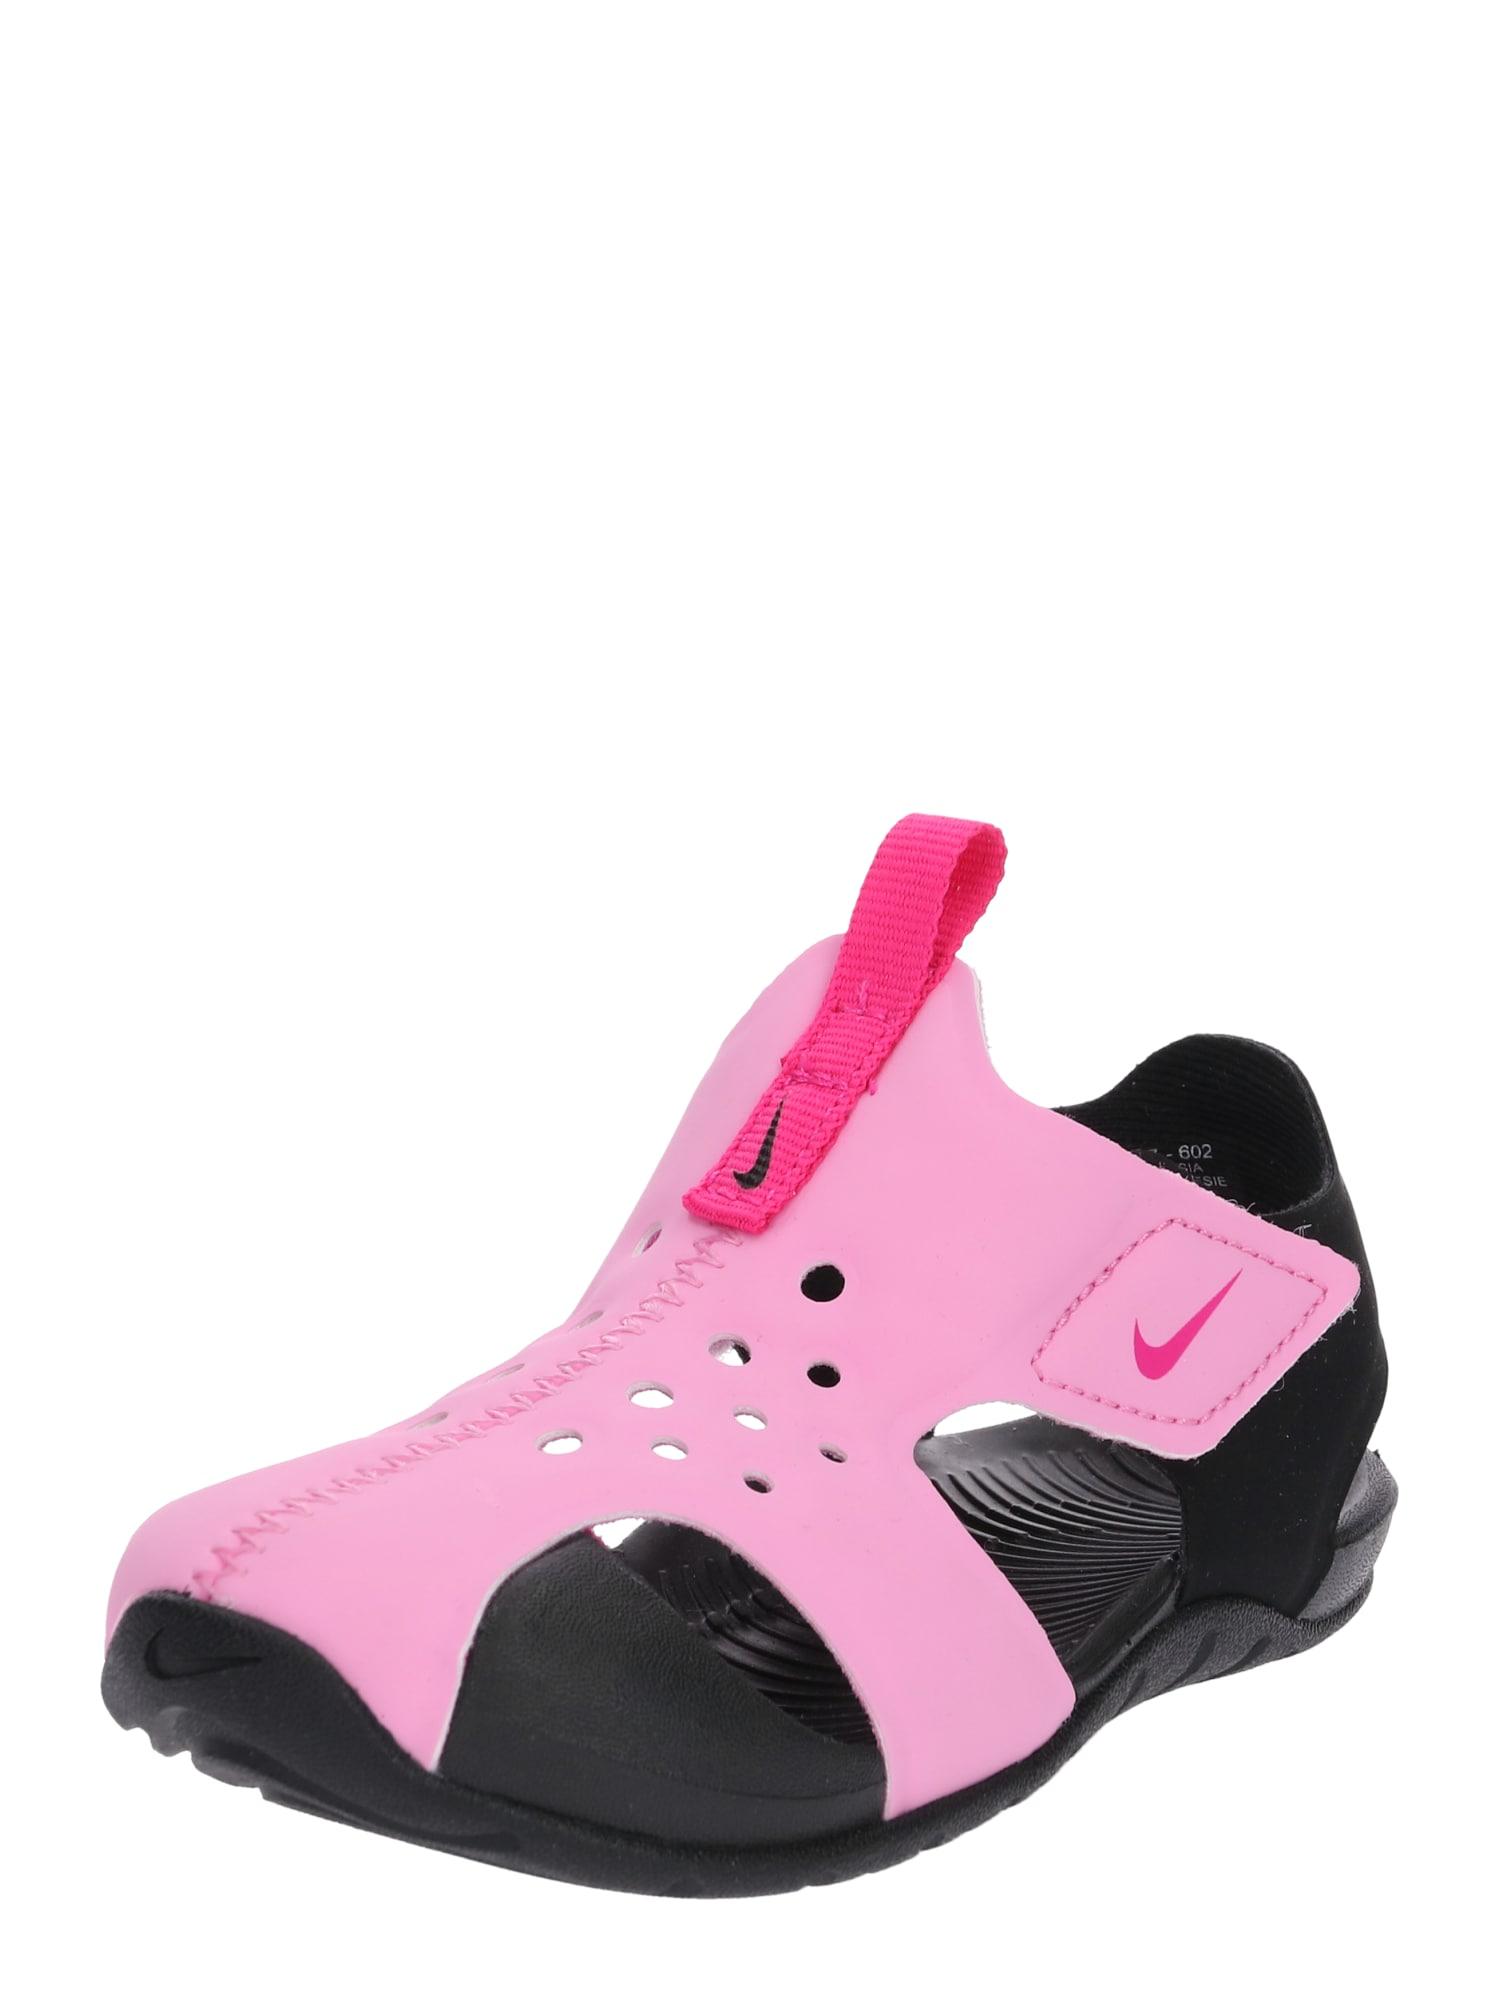 NIKE, Jongens Sportschoen 'Sunray Protect 2 TD', pink